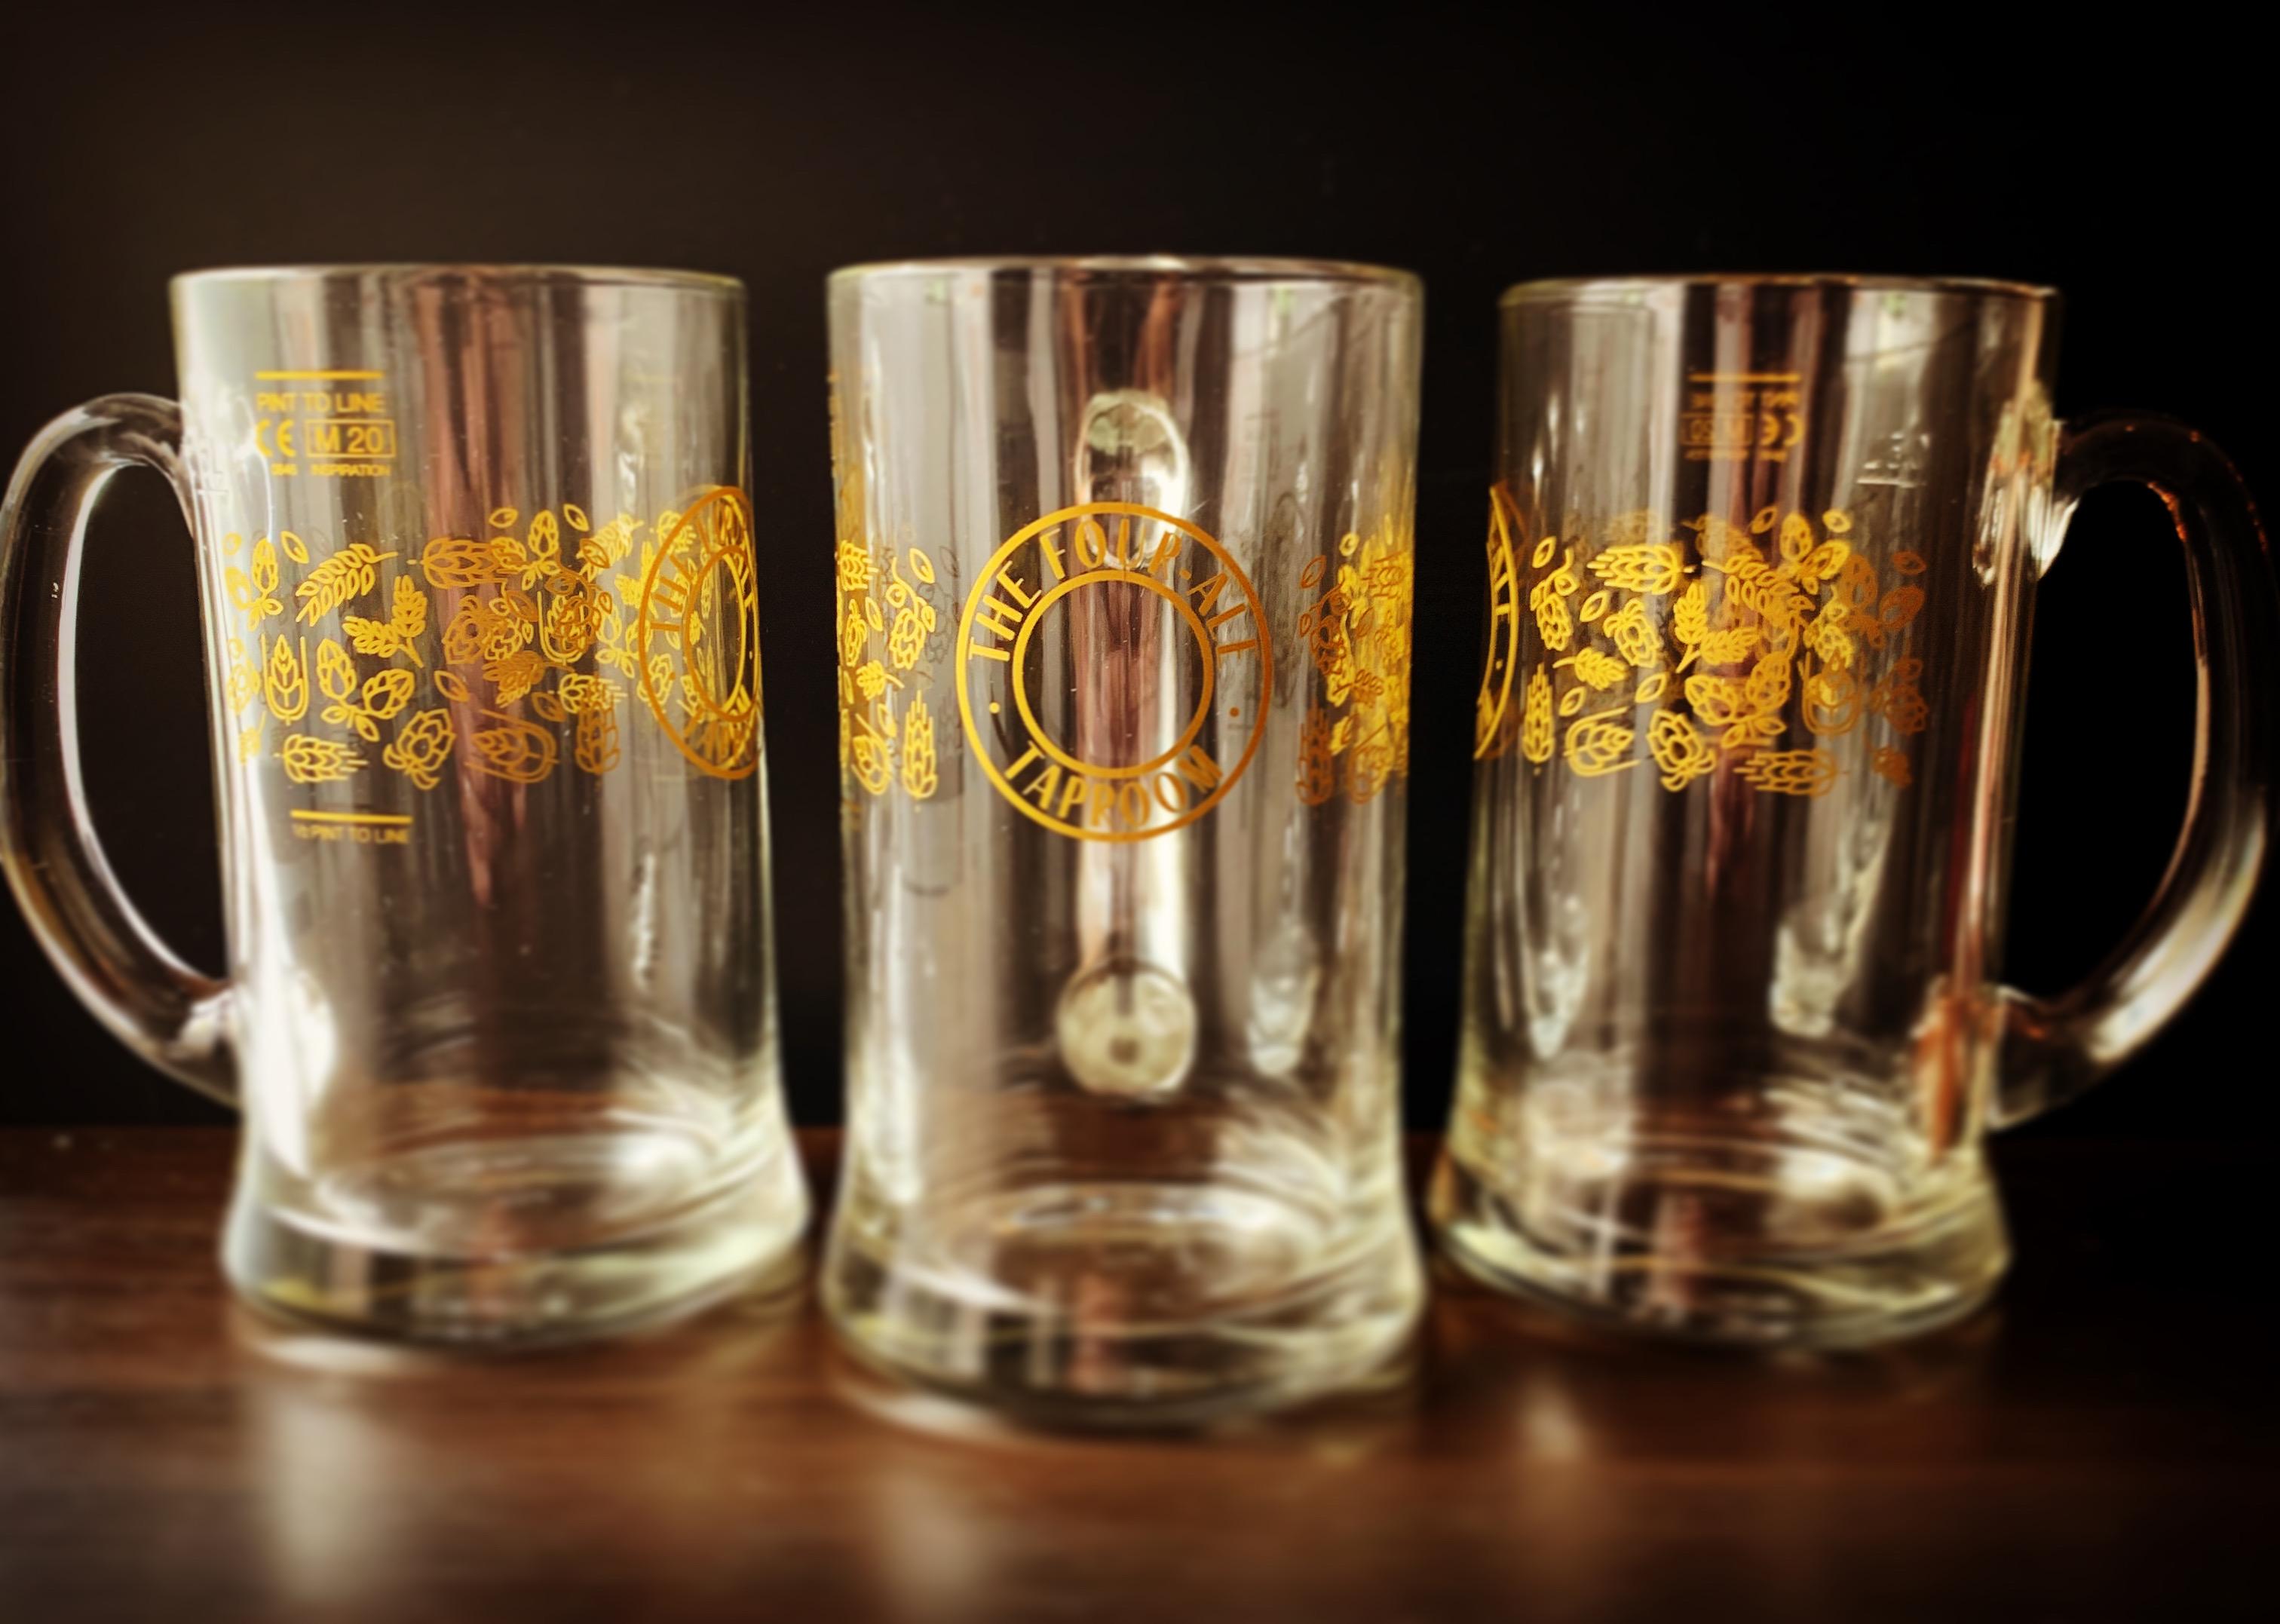 The Four-Ale Glass - Pint Jug